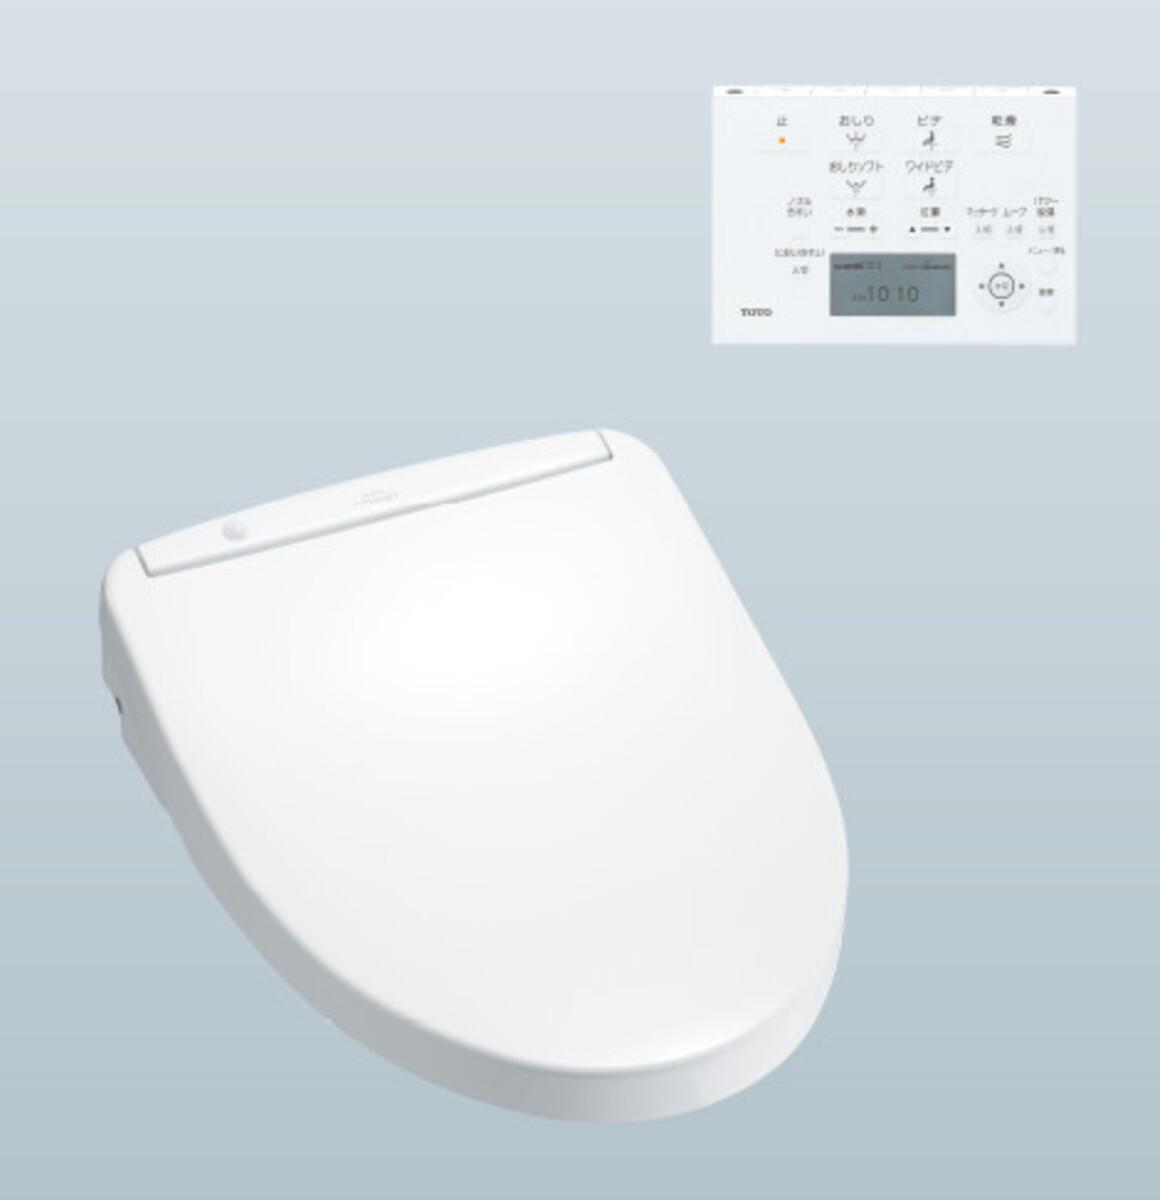 ŧ§ あす楽対応品 TOTO ウォシュレット アプリコットF3 売買 リモコン付 送料無料 #NW1 .限定在庫品∴ホワイト 旧4731 :TCF4733R 常 レバー洗浄